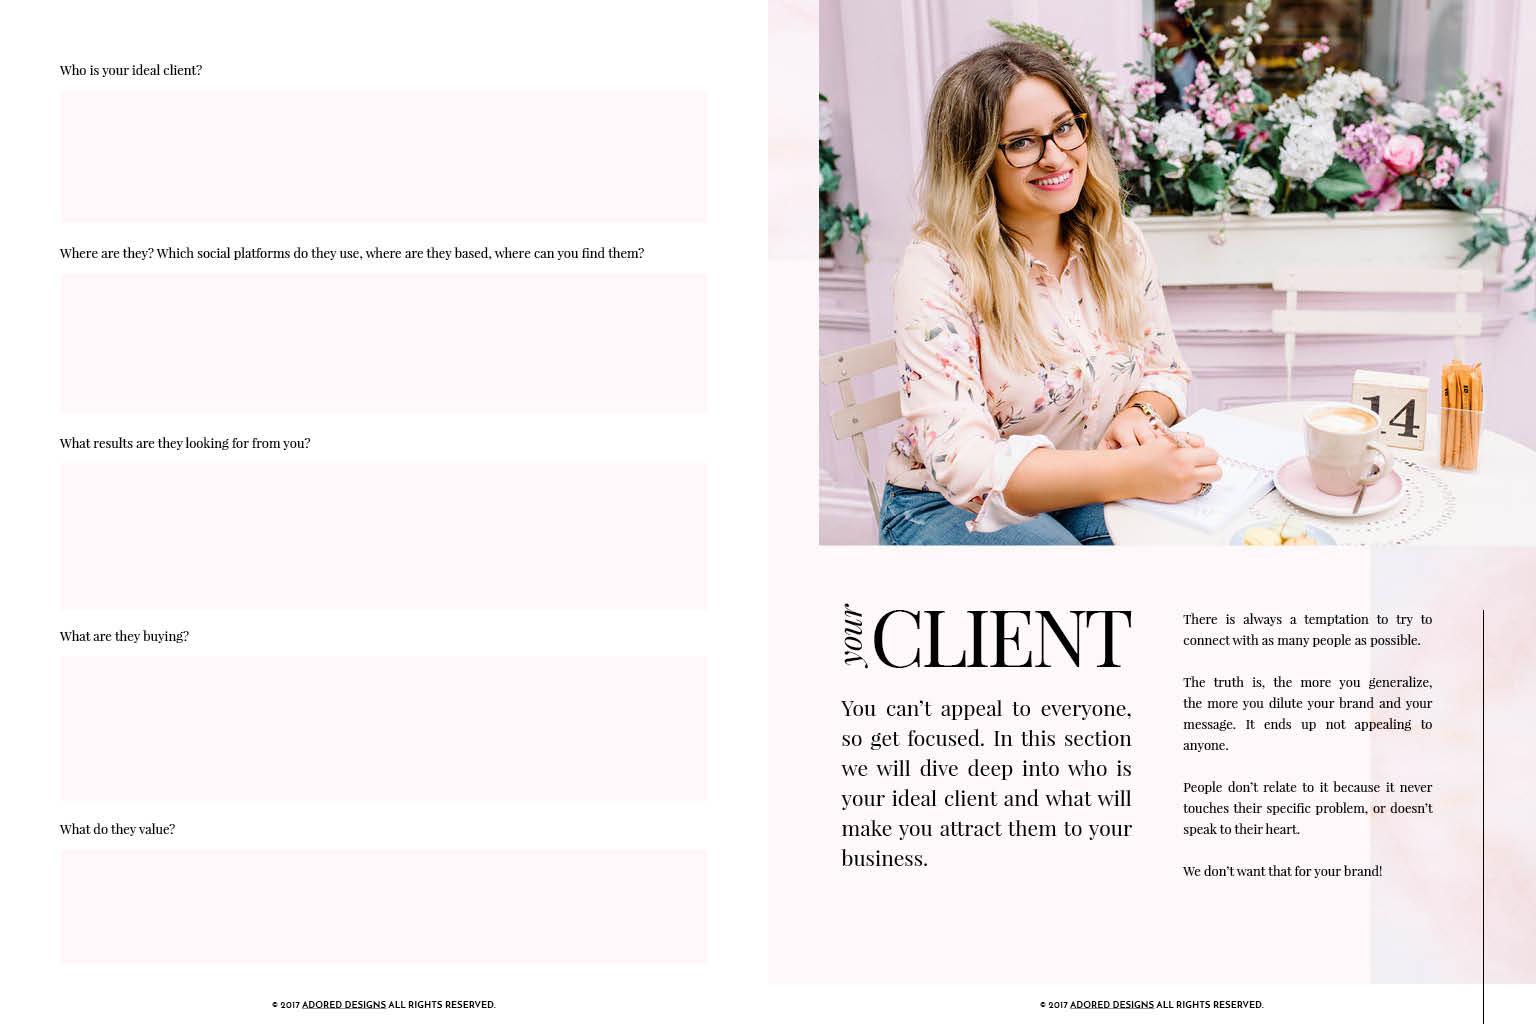 Brand-clarity-workbook-new-nov-20177